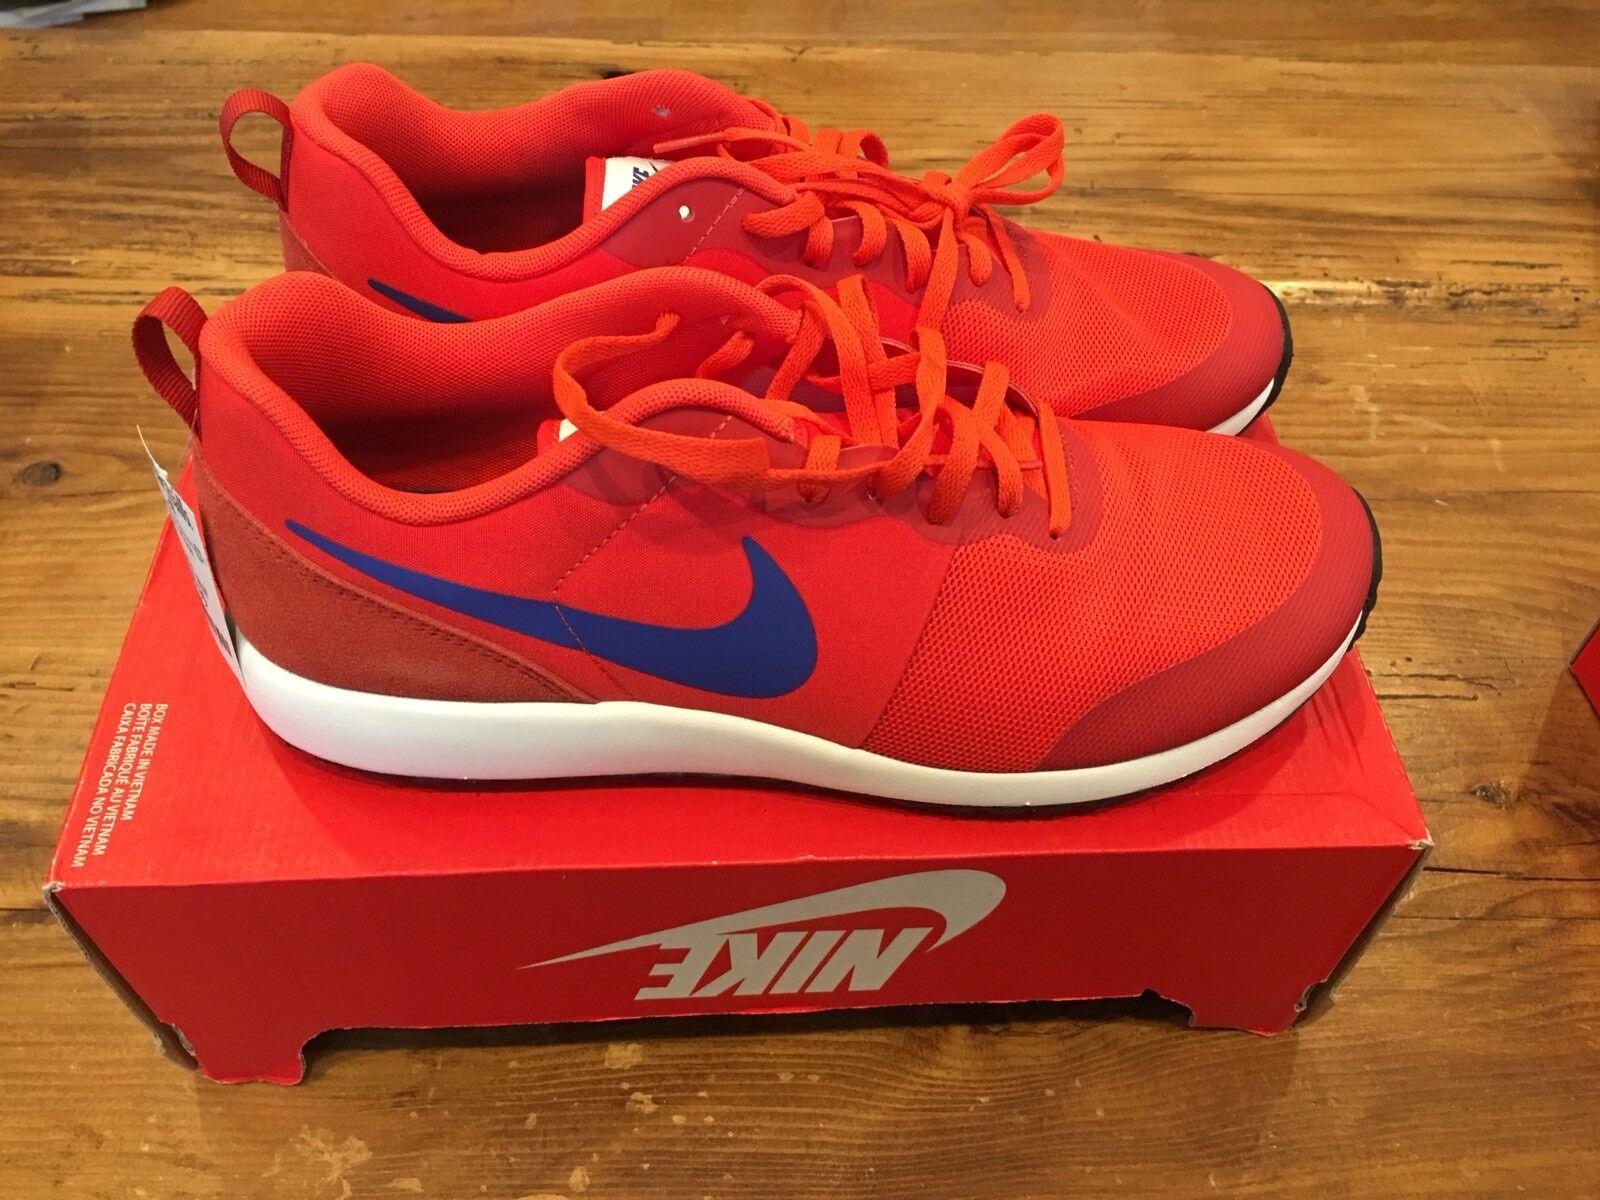 Nike Elite Shinsen Training Running Shoes Sneakers - NWT Men's Size 9.5